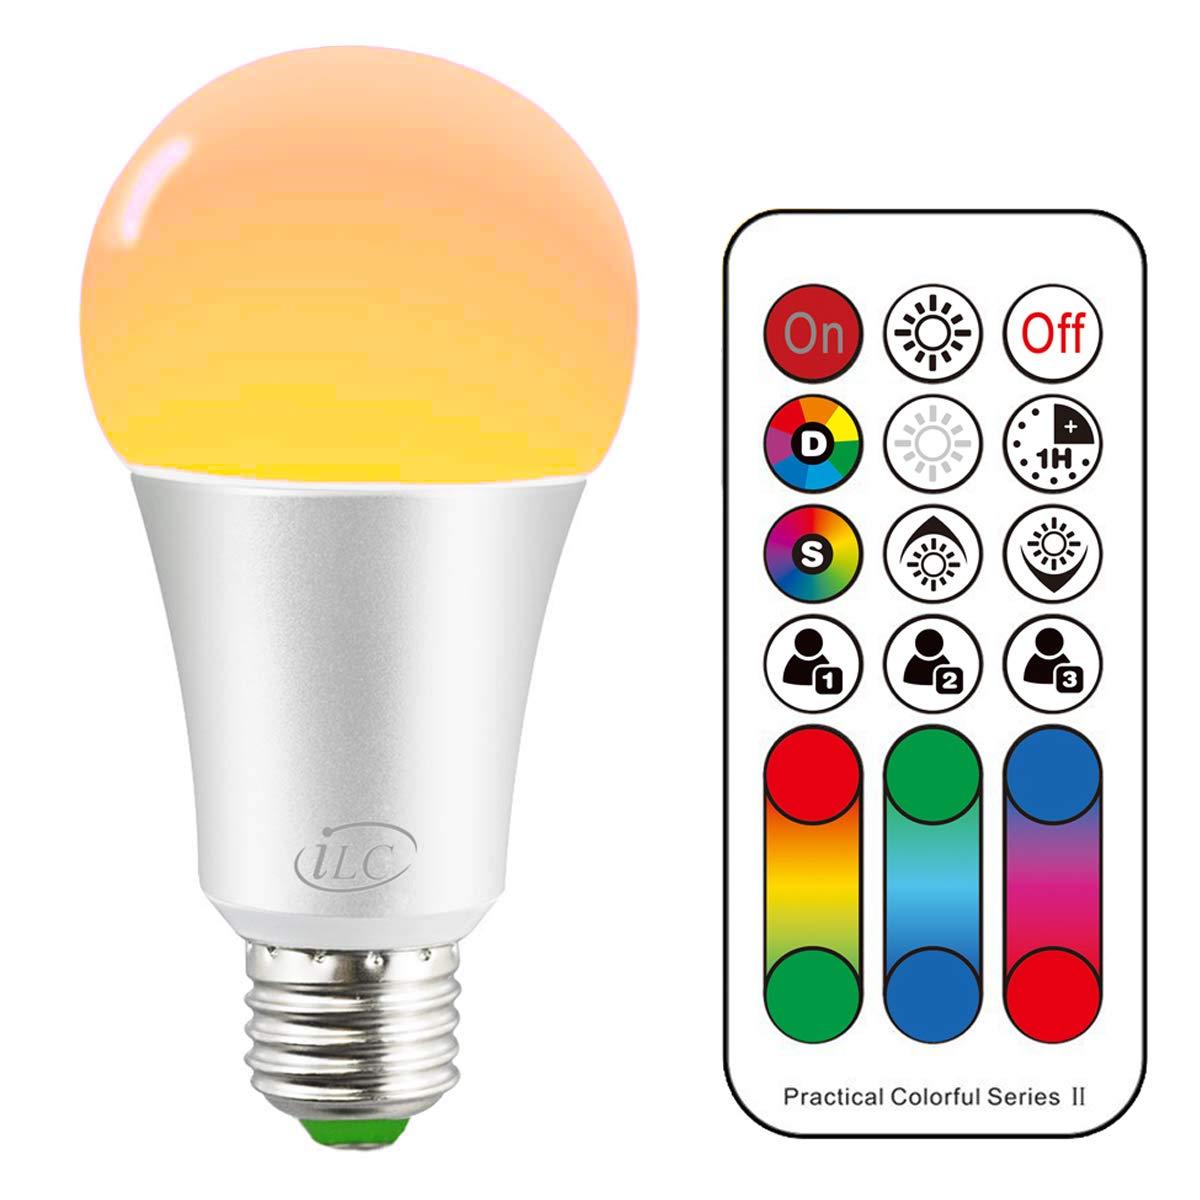 iLC Bombillas Colores RGBW Lá mpara LED Bombilla Regulable Cambio de Color Blanco Cá lido 2700K A60 Edison 10W Esfé rica E27 Casquillo Gordo - RGB 120 Colore - Control remoto Incluido - Equivalente de 60 Watt